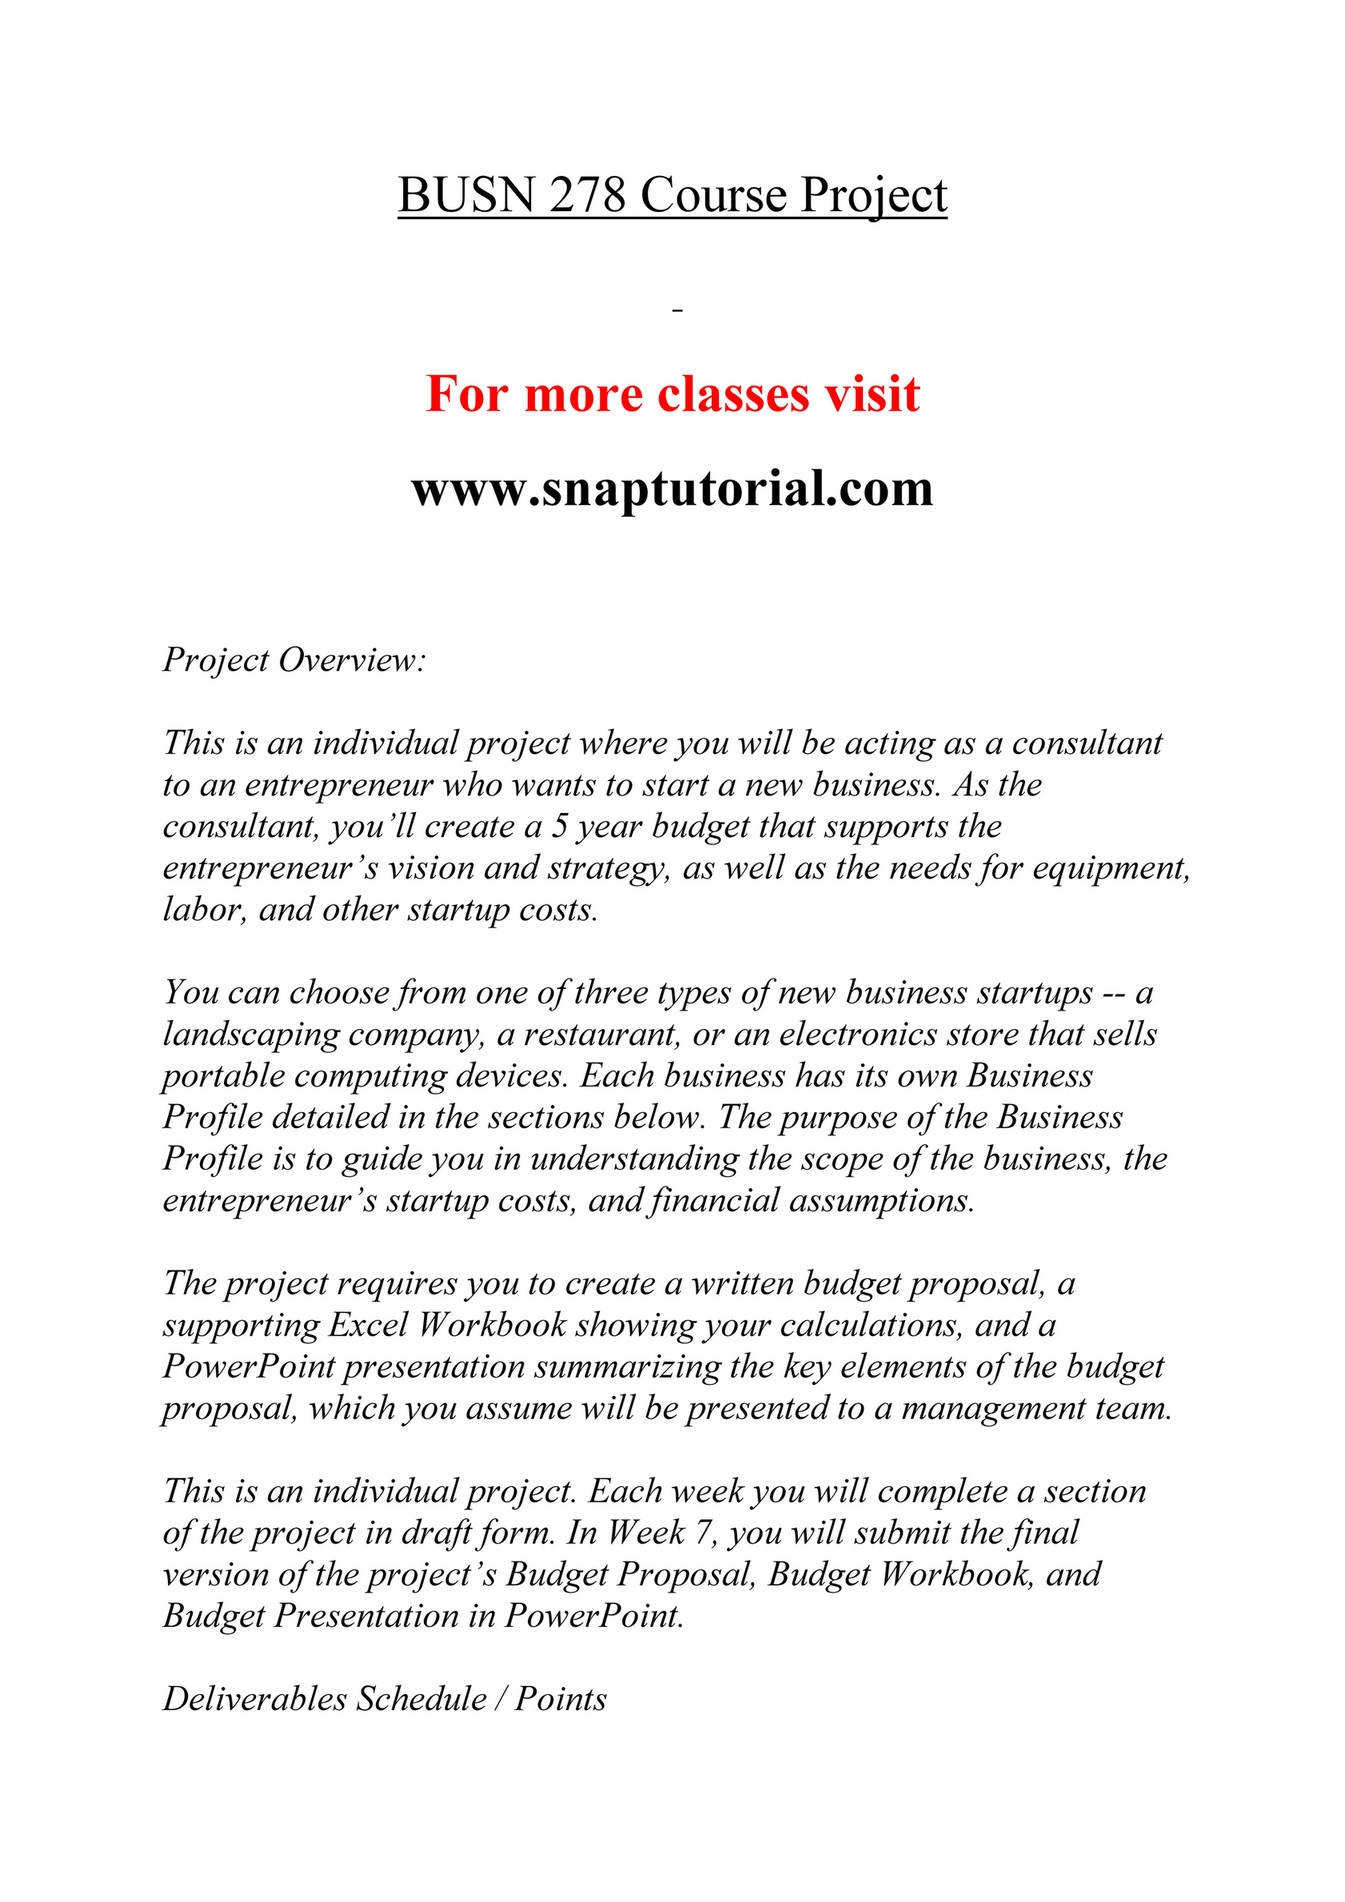 Ashford University - BUSN 278 Course Extrordinary Success